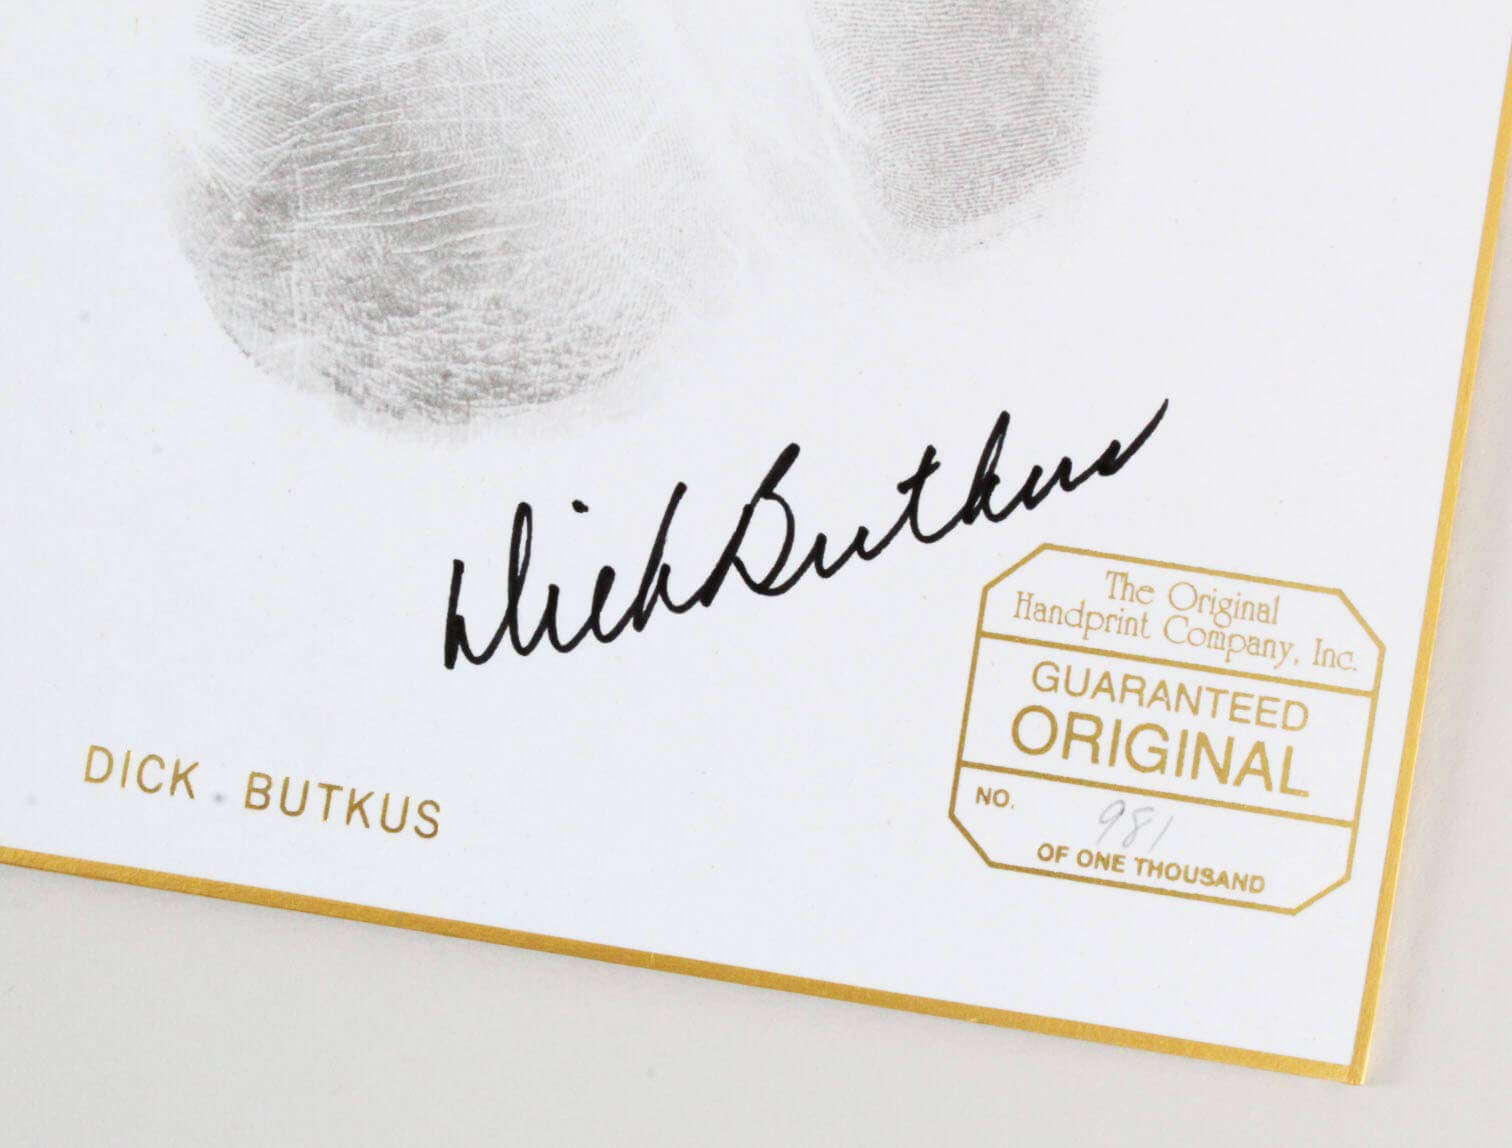 Gale Sayers & Dick Butkus Signed Hand Prints Bears – COA